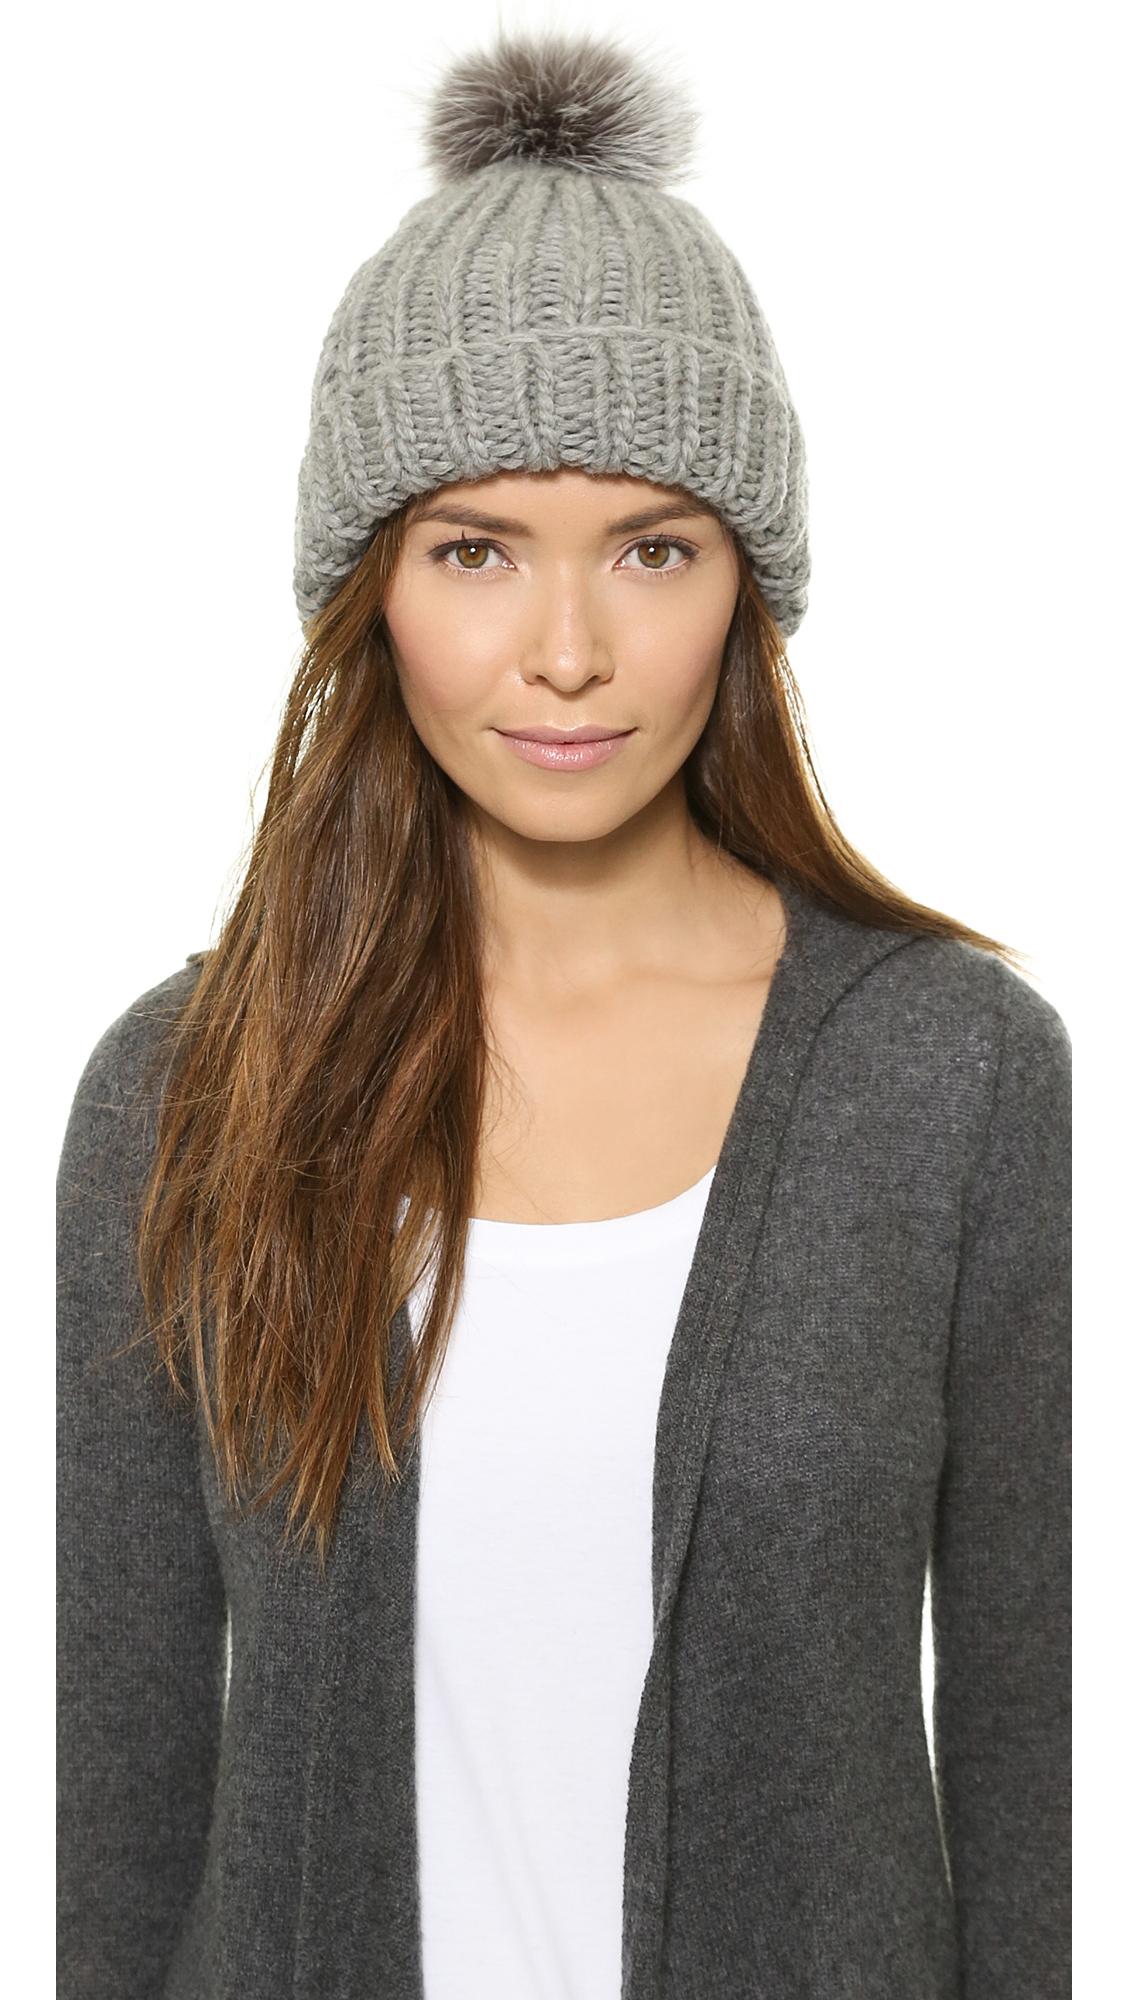 Lyst - Eugenia Kim Rain Pom Pom Hat - Black in Gray f4d0a402a72